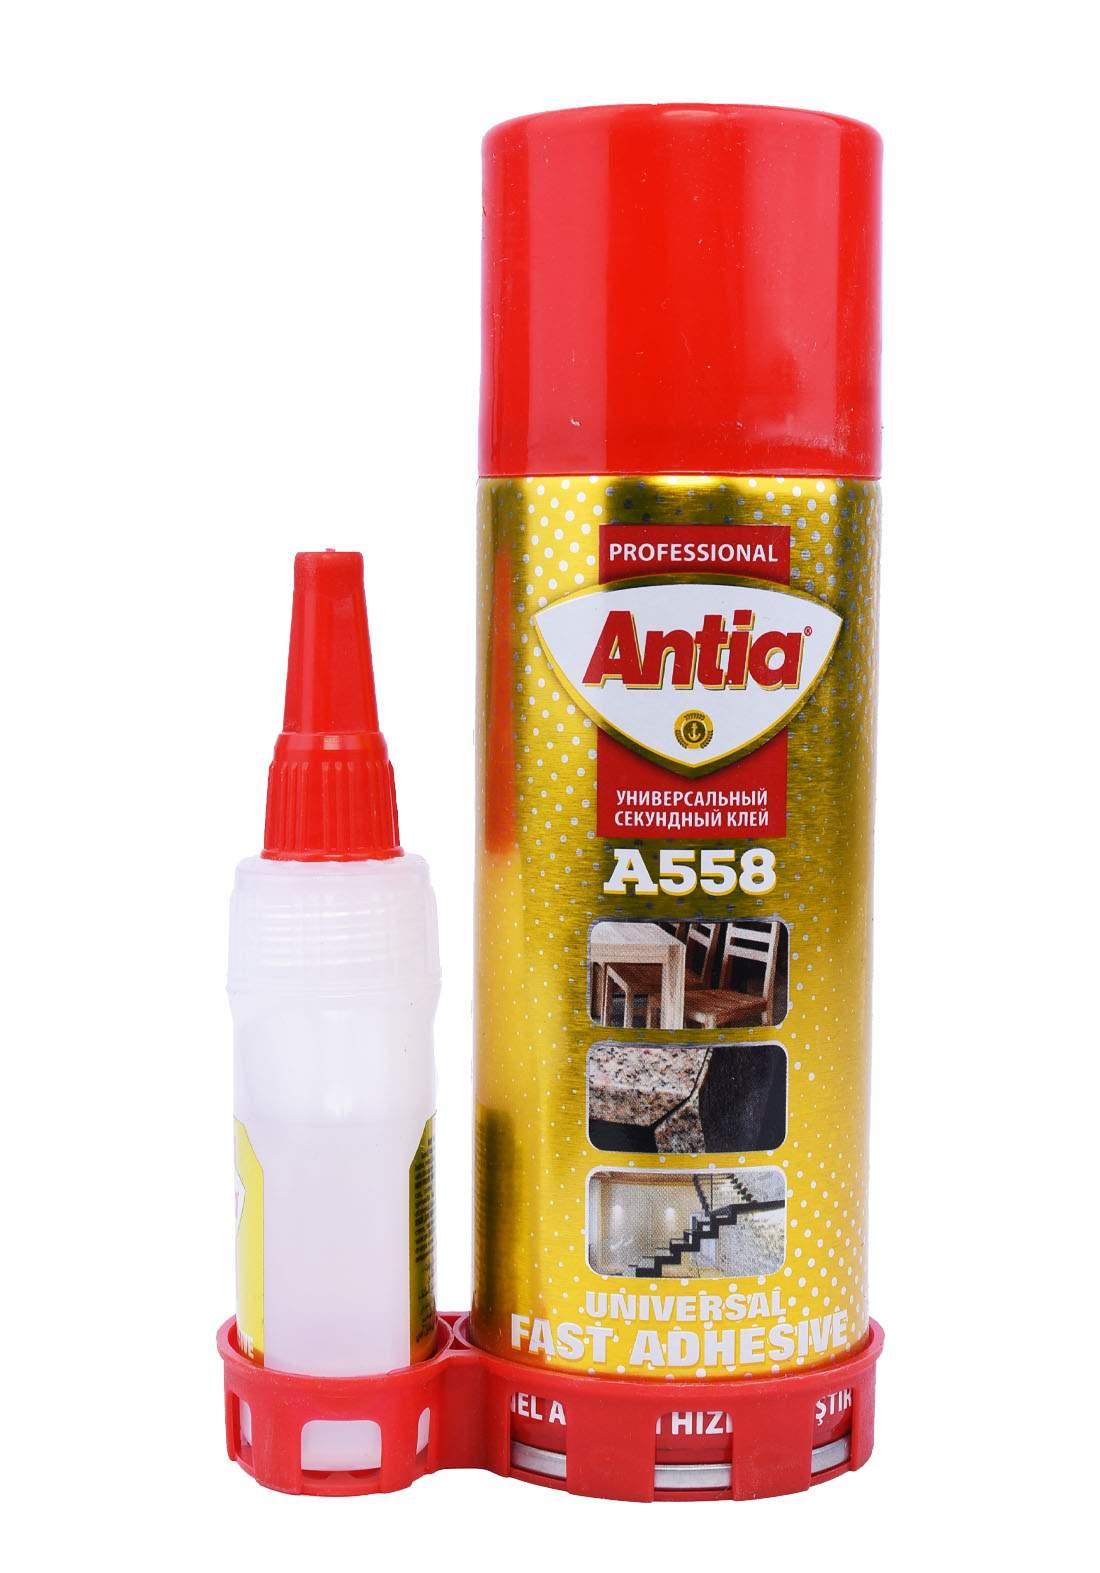 Antia An-E7005 Universal Fast Adhesive Mdf A558 200ml لاصق سريع